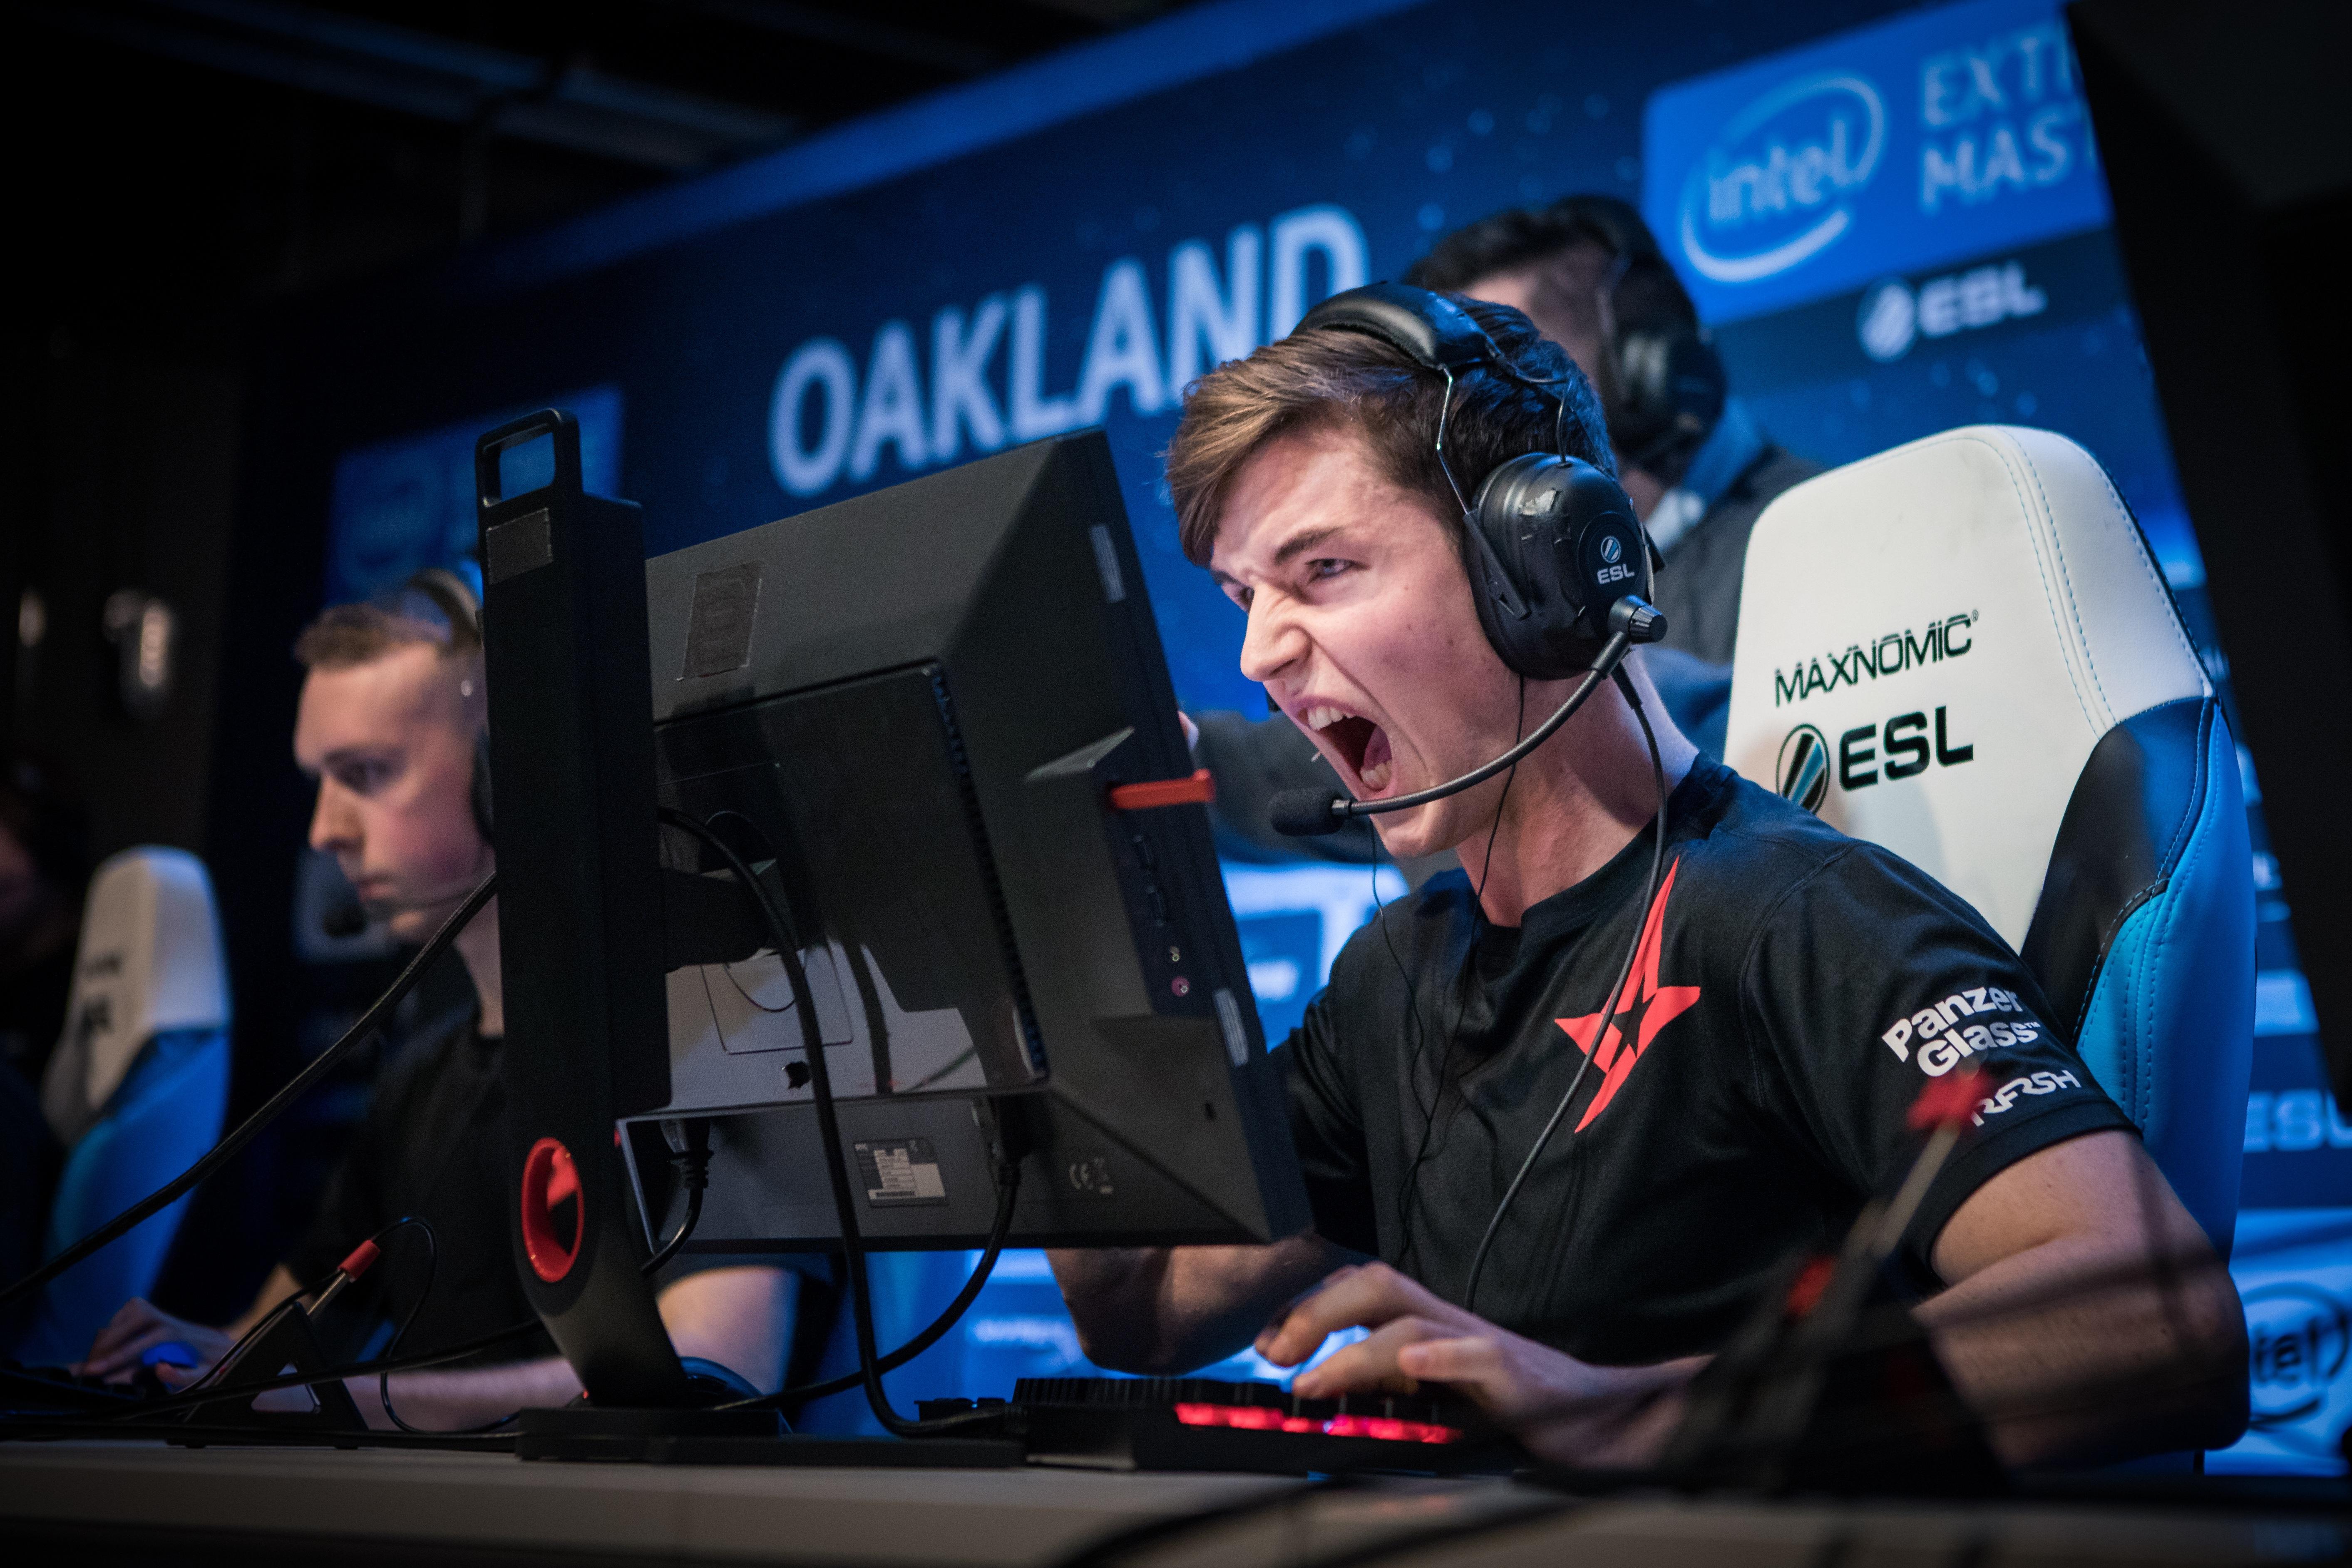 ESL-Intel-Extreme-Masters-2017-Oakland-6